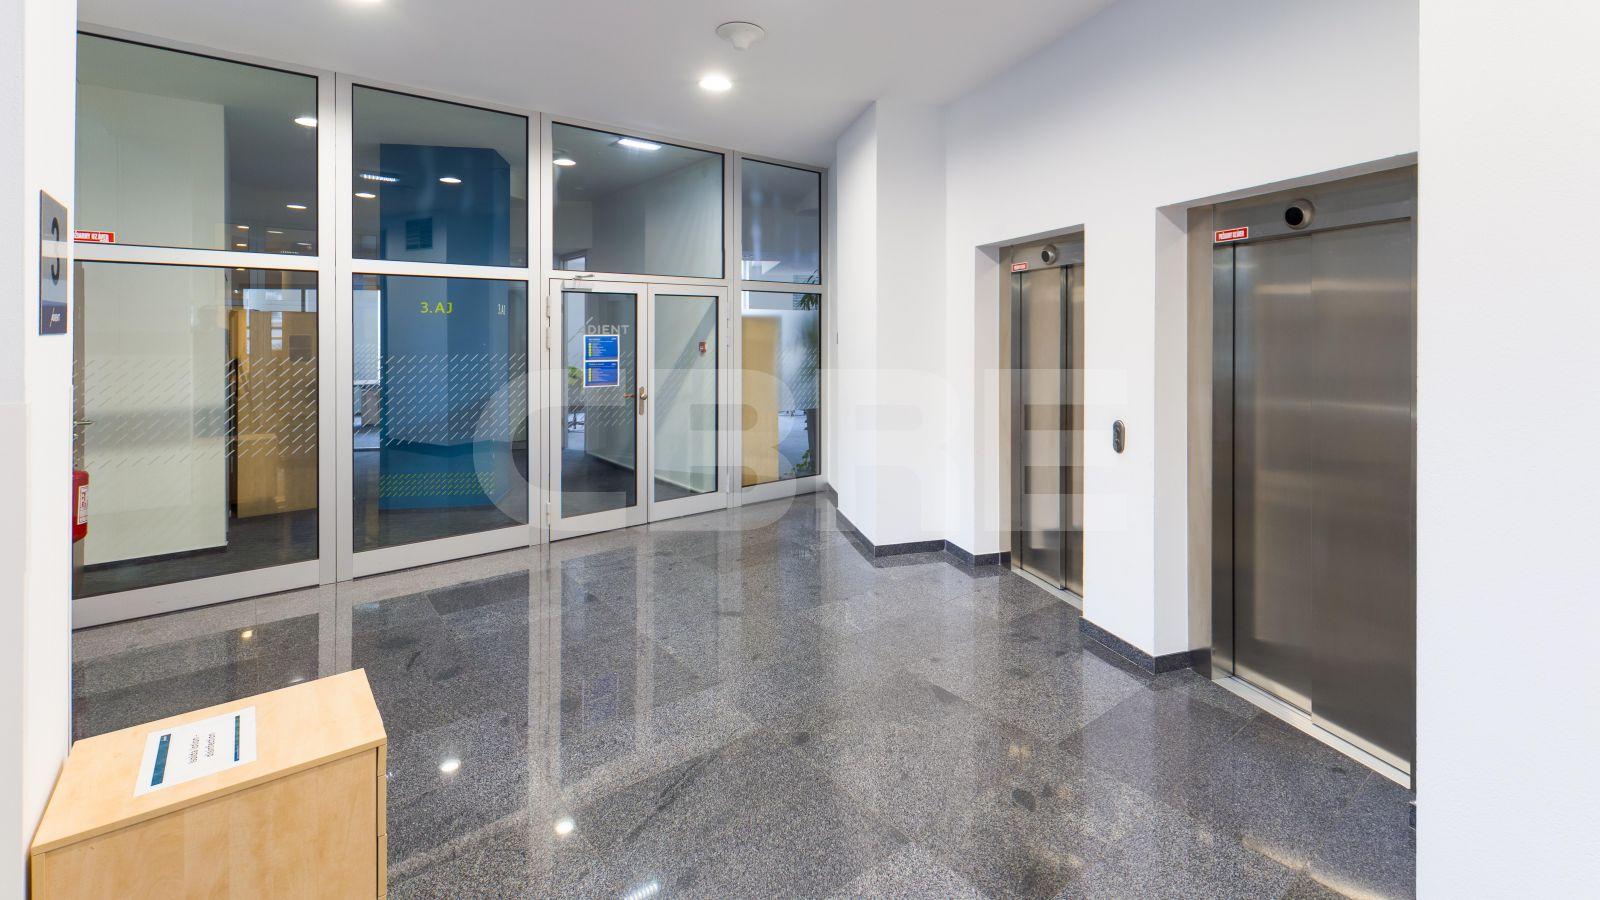 Pressburg Trade Center - Sublease, Bratislava - Staré Mesto | Offices for rent by CBRE | 1